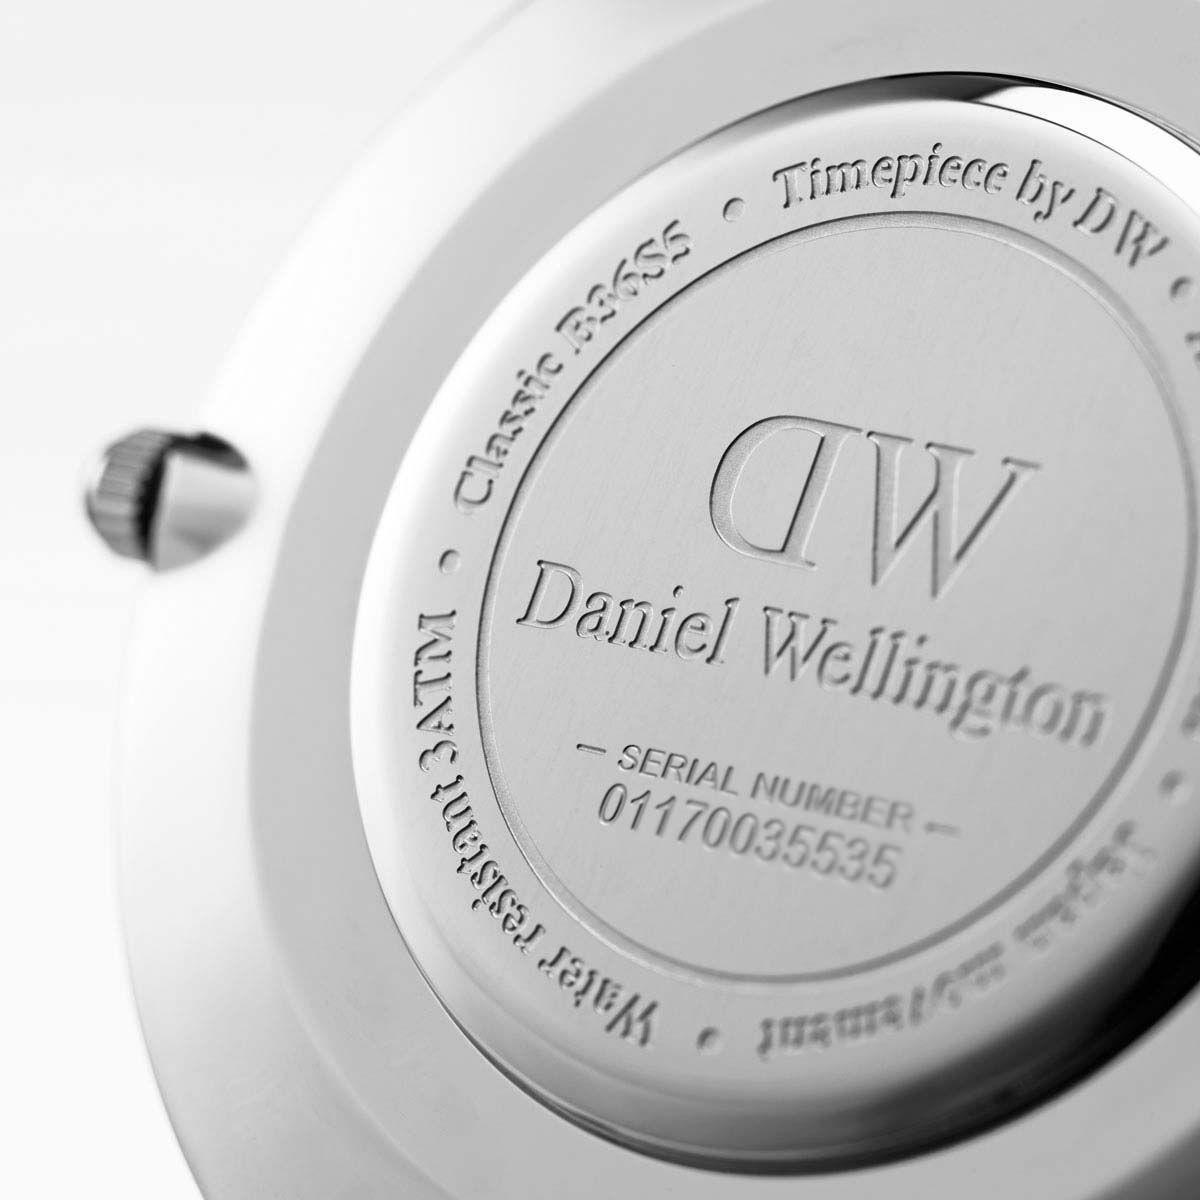 dw官网 dw手表官网 dw中国官网 dw官方旗舰店 DW DW官网  W Classic Sheffield Silver 36mm